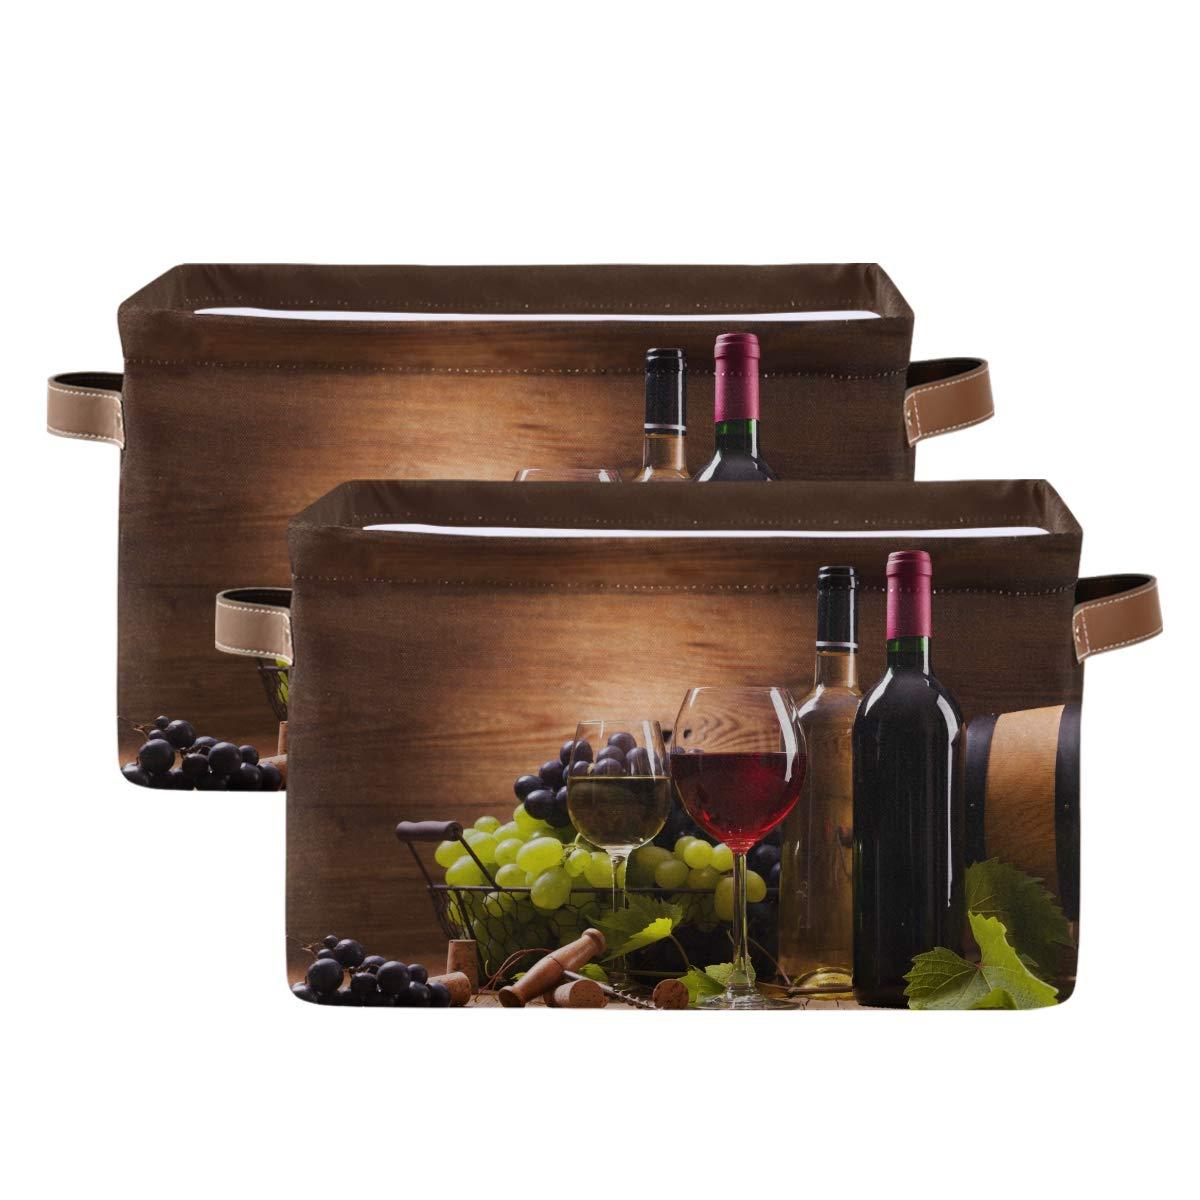 WXLIFE Now free shipping Storage Basket Bins Retro Glass Backgr Wooden mart Grapes Wine